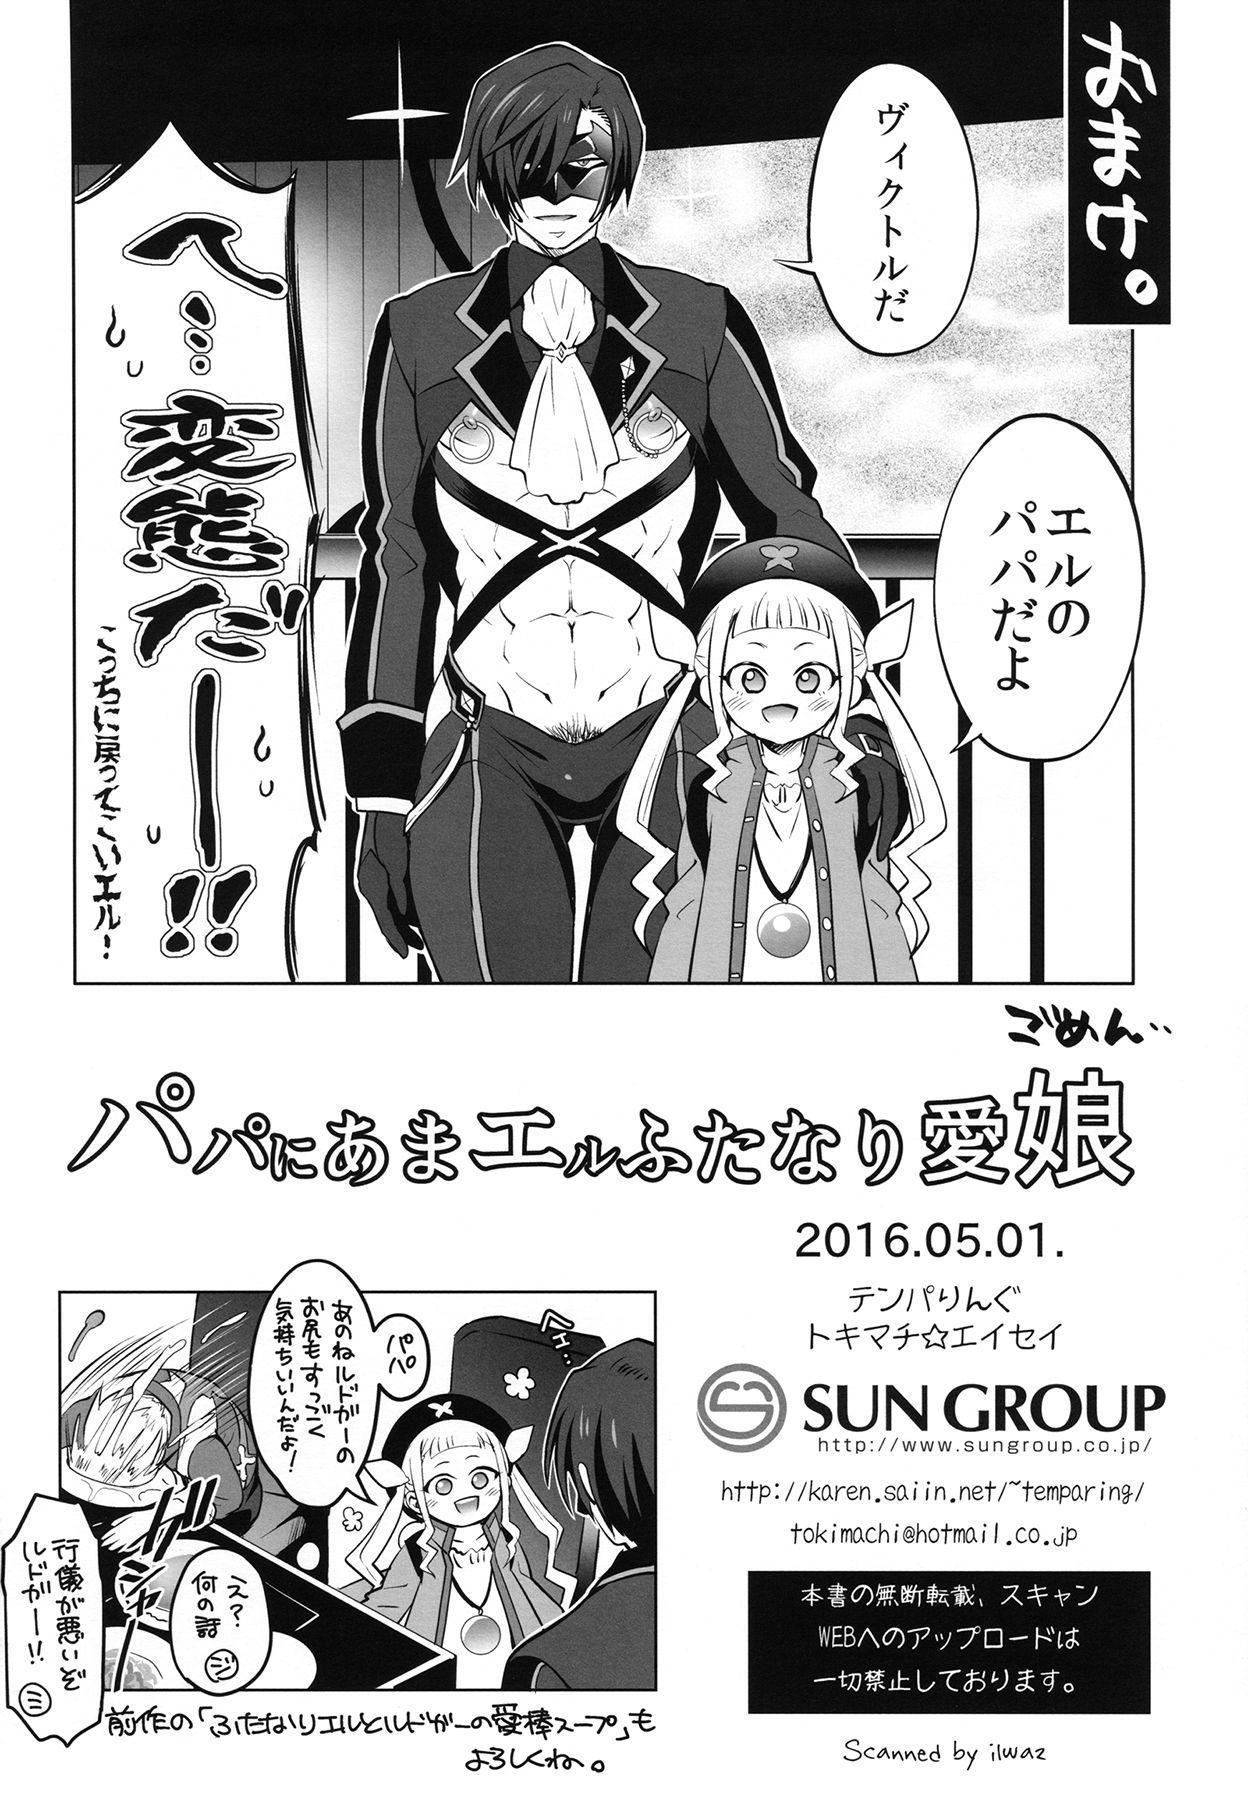 (COMIC1☆10) [Temparing (Tokimachi Eisei)] Papa ni AmaElle Futanari Manamusume | Daddy's Spoiled, BELLEoved Little (Futanari) Girl (Tales of Xillia 2) [English] [Zero Translations] 28